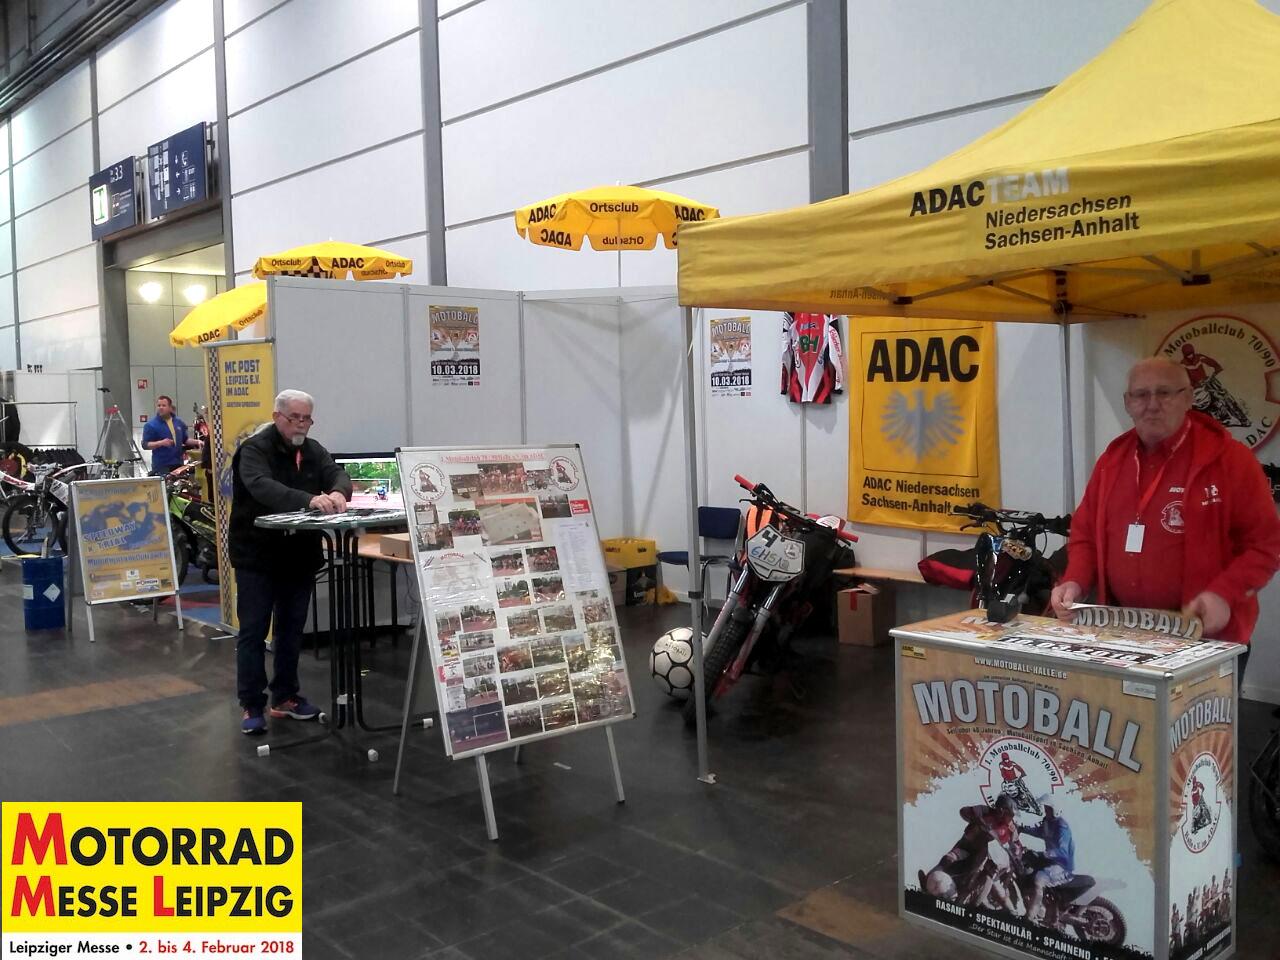 Motorrad Messe Leipzig 2018